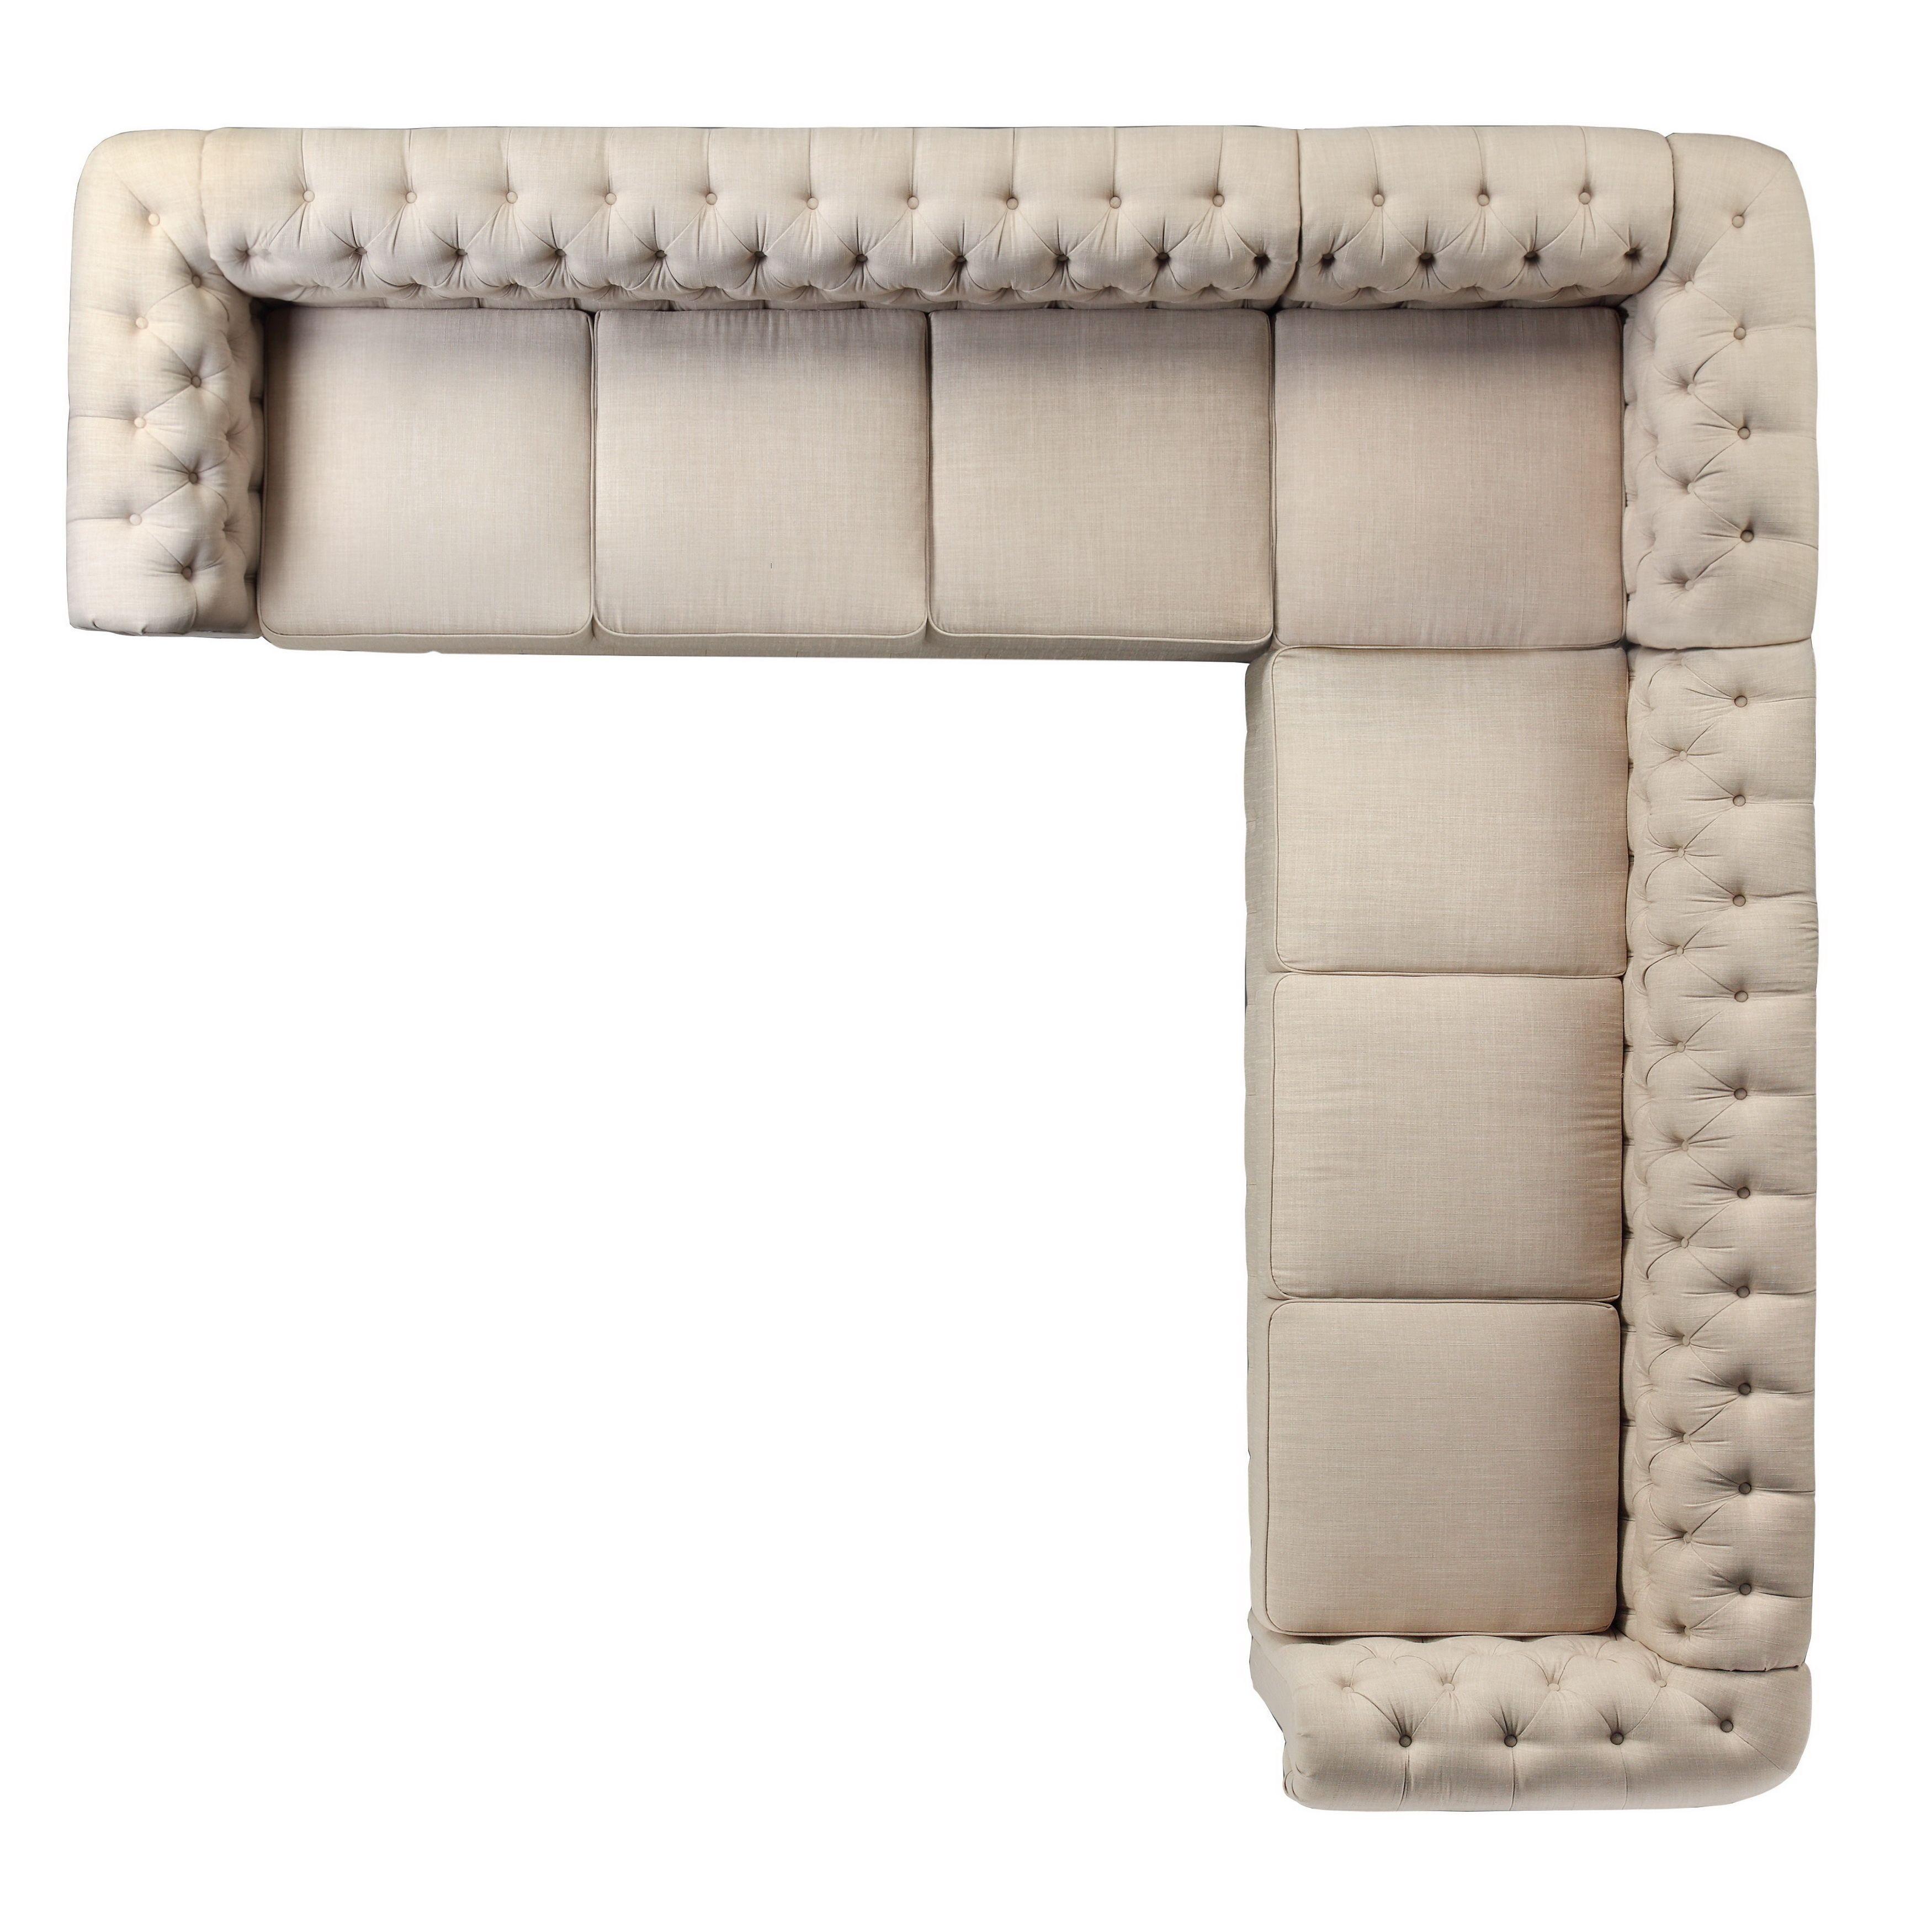 l shaped sofa set designs voyager lay flat reclining reviews best 25 43 shape ideas on pinterest corner